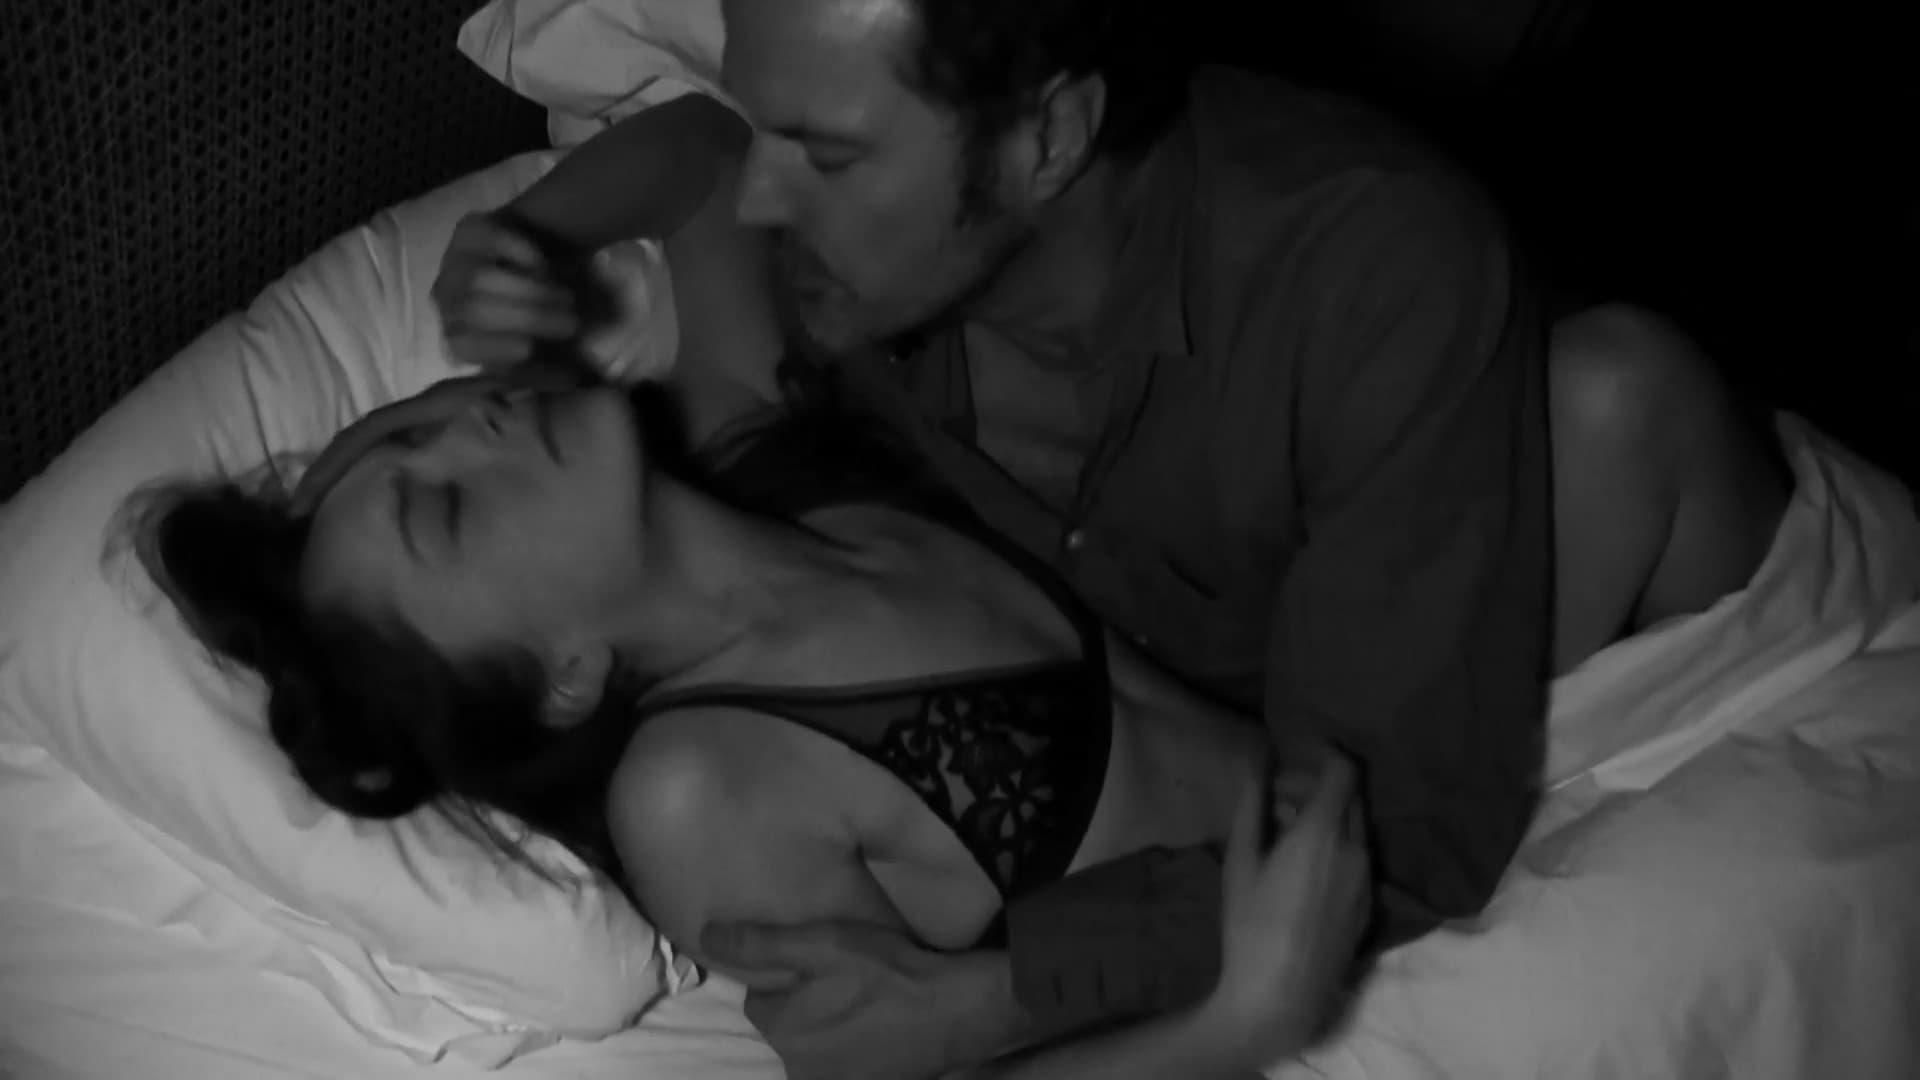 Suspension of Disbelief Full Movie Online   20Movies